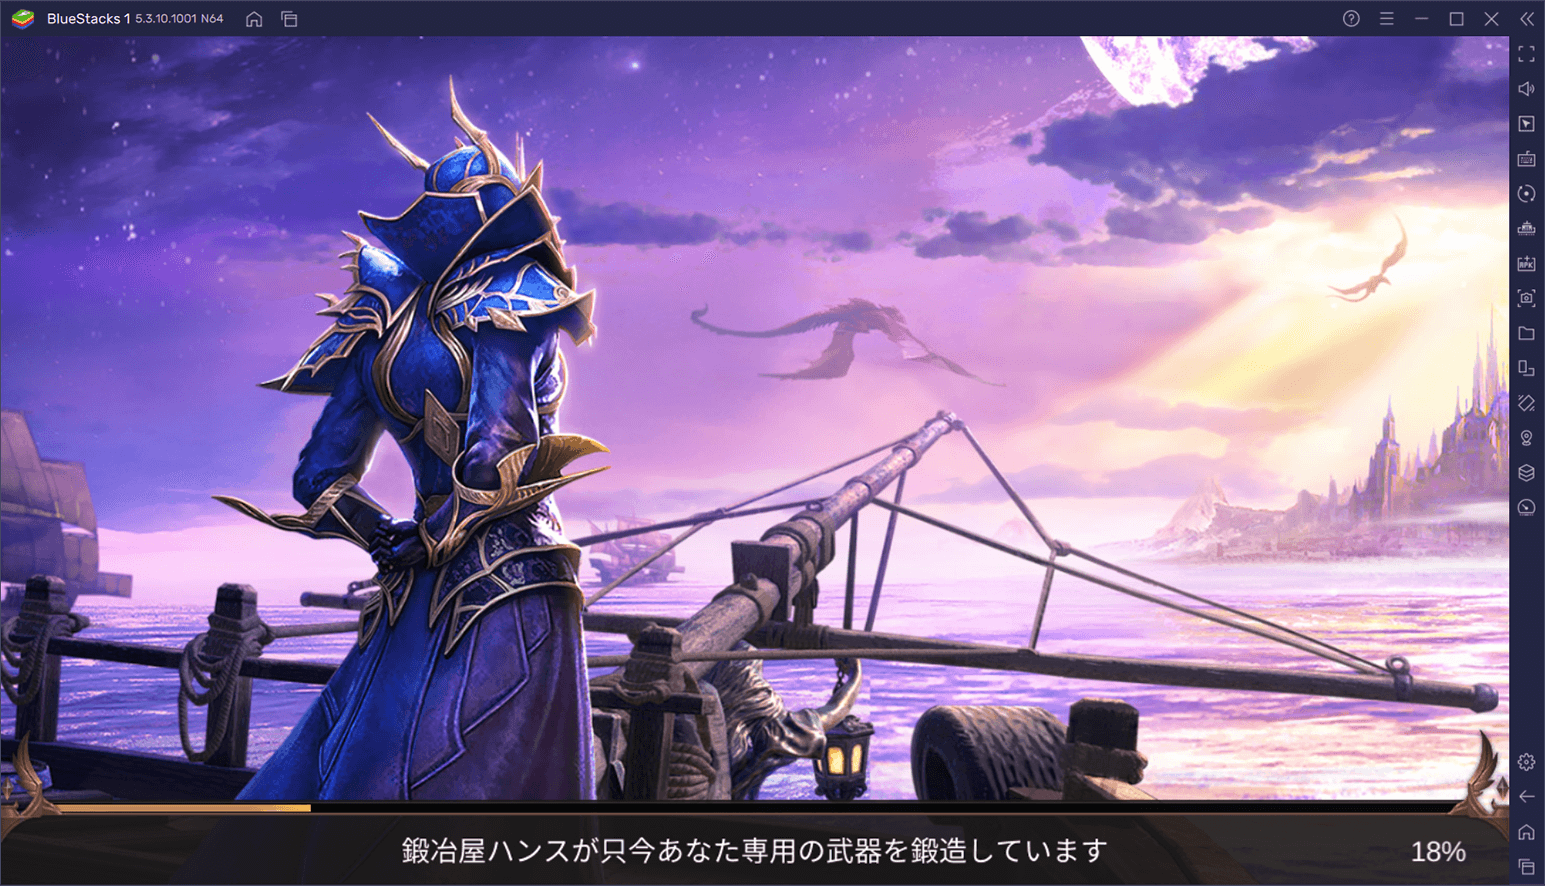 BlueStacksを使ってPCで『MU:アークエンジェル』を遊ぼう